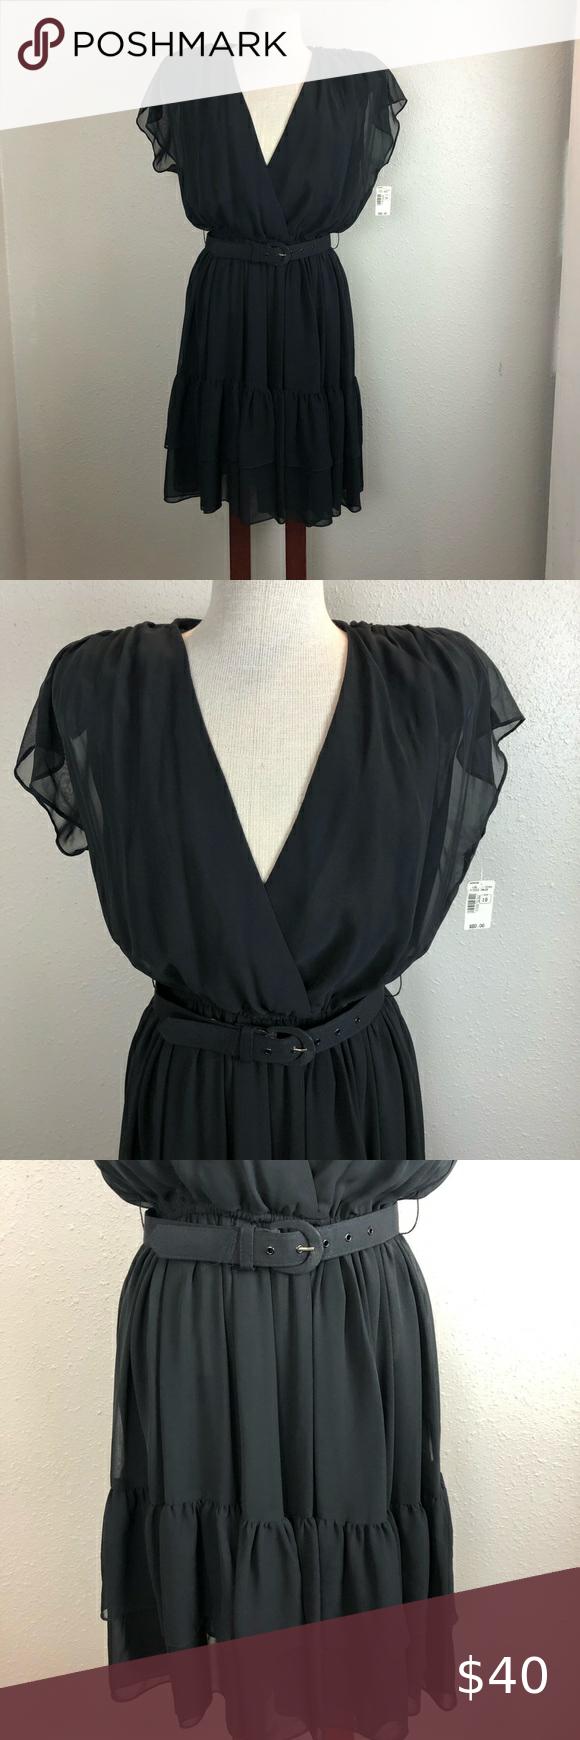 Nwt Vintage Phoebe Black Dress Size 10 Vintage Black Dress Black Dress Size 10 Dresses [ 1740 x 580 Pixel ]